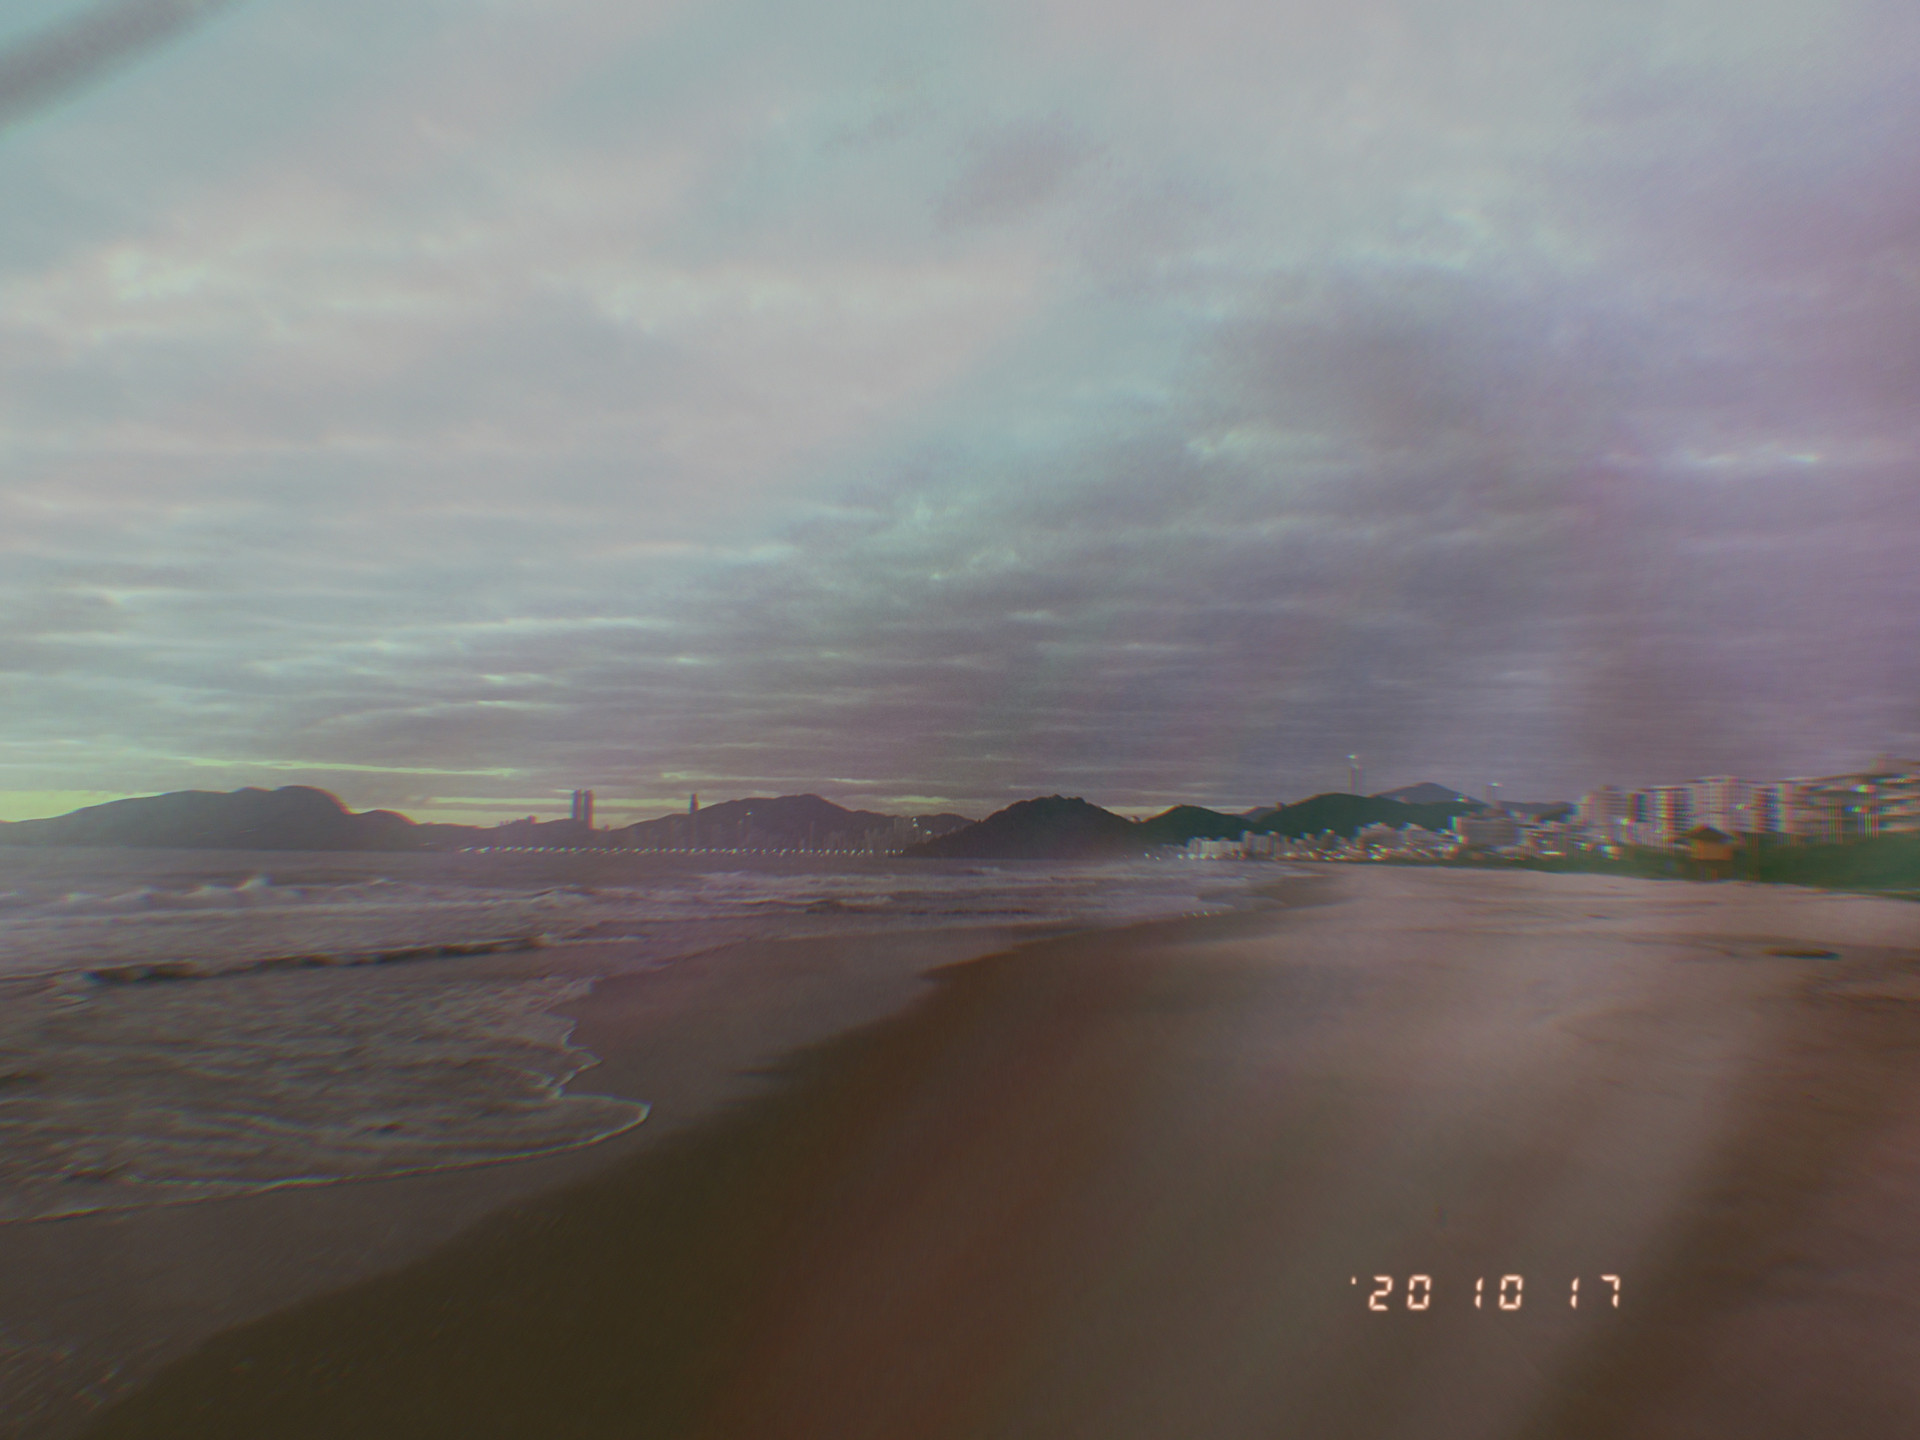 IMG_7989.JPG